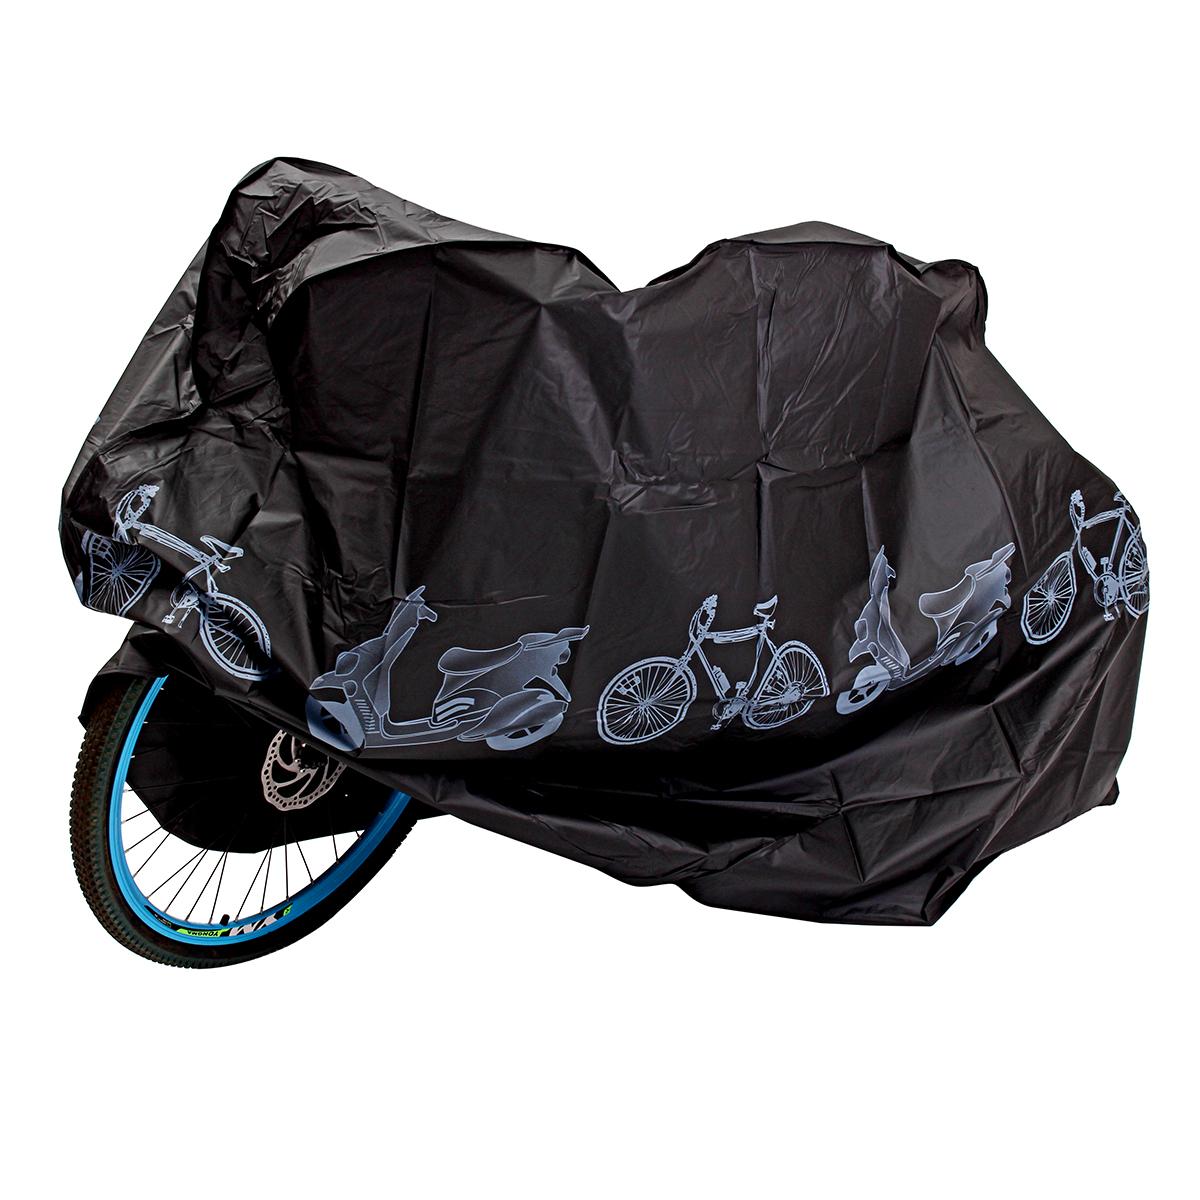 High-Quality-Waterproof-Bicycle-Bike-Cover-Dust-Rain-Garage-Storage-Protector